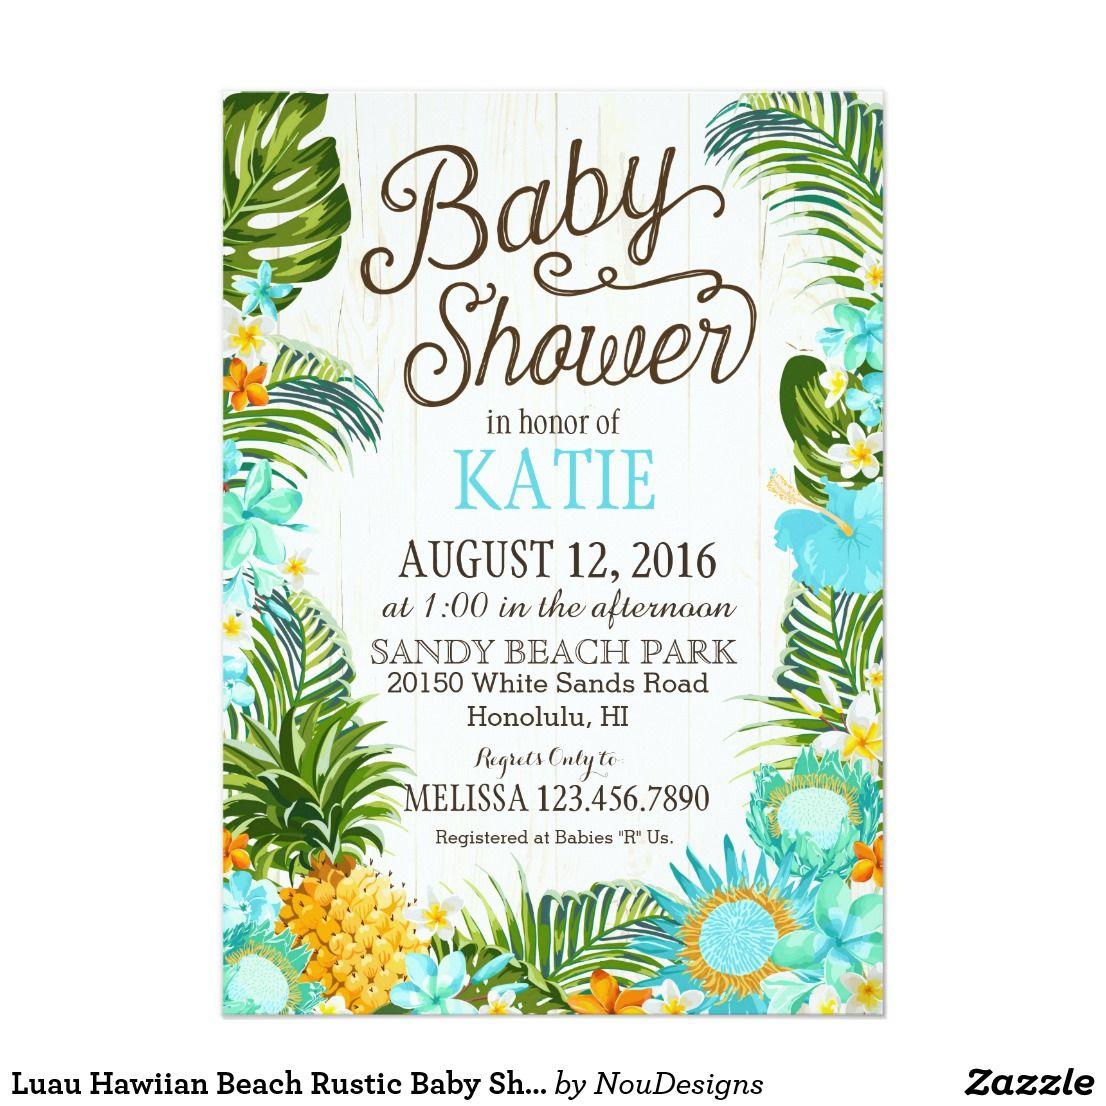 Luau Hawiian Beach Rustic Baby Shower Card | Baby Shower Gavin ...